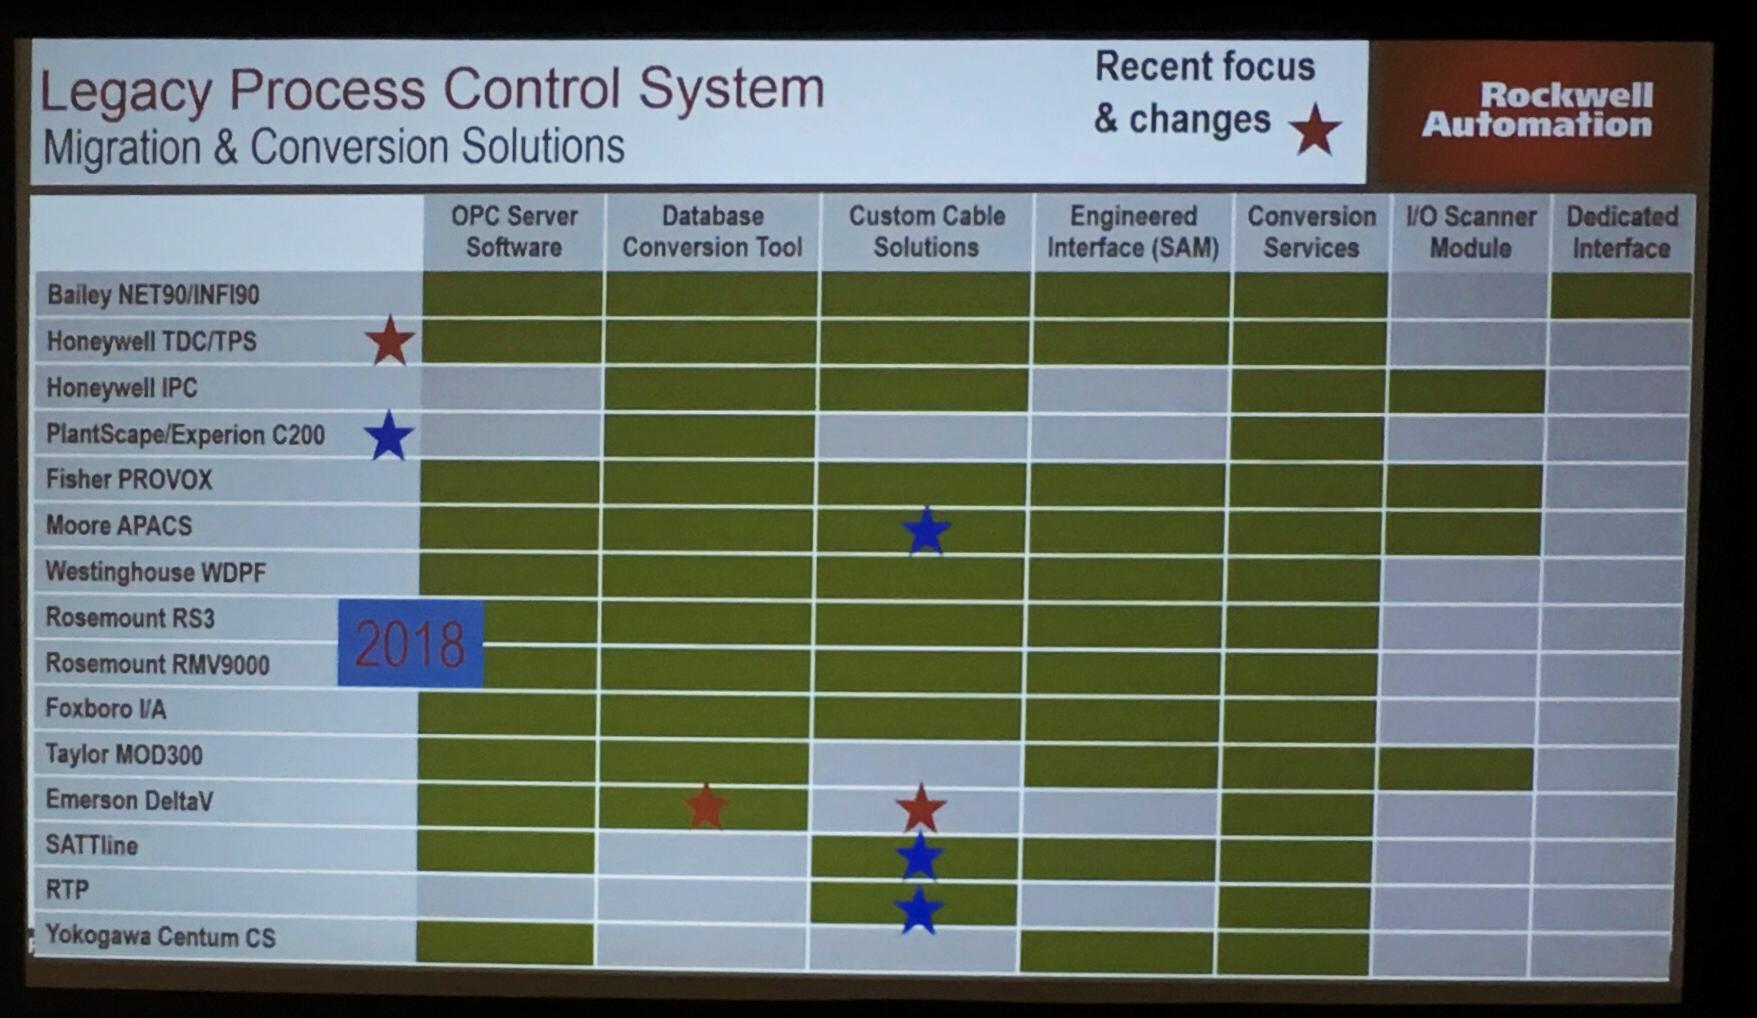 Legacy Process Control System